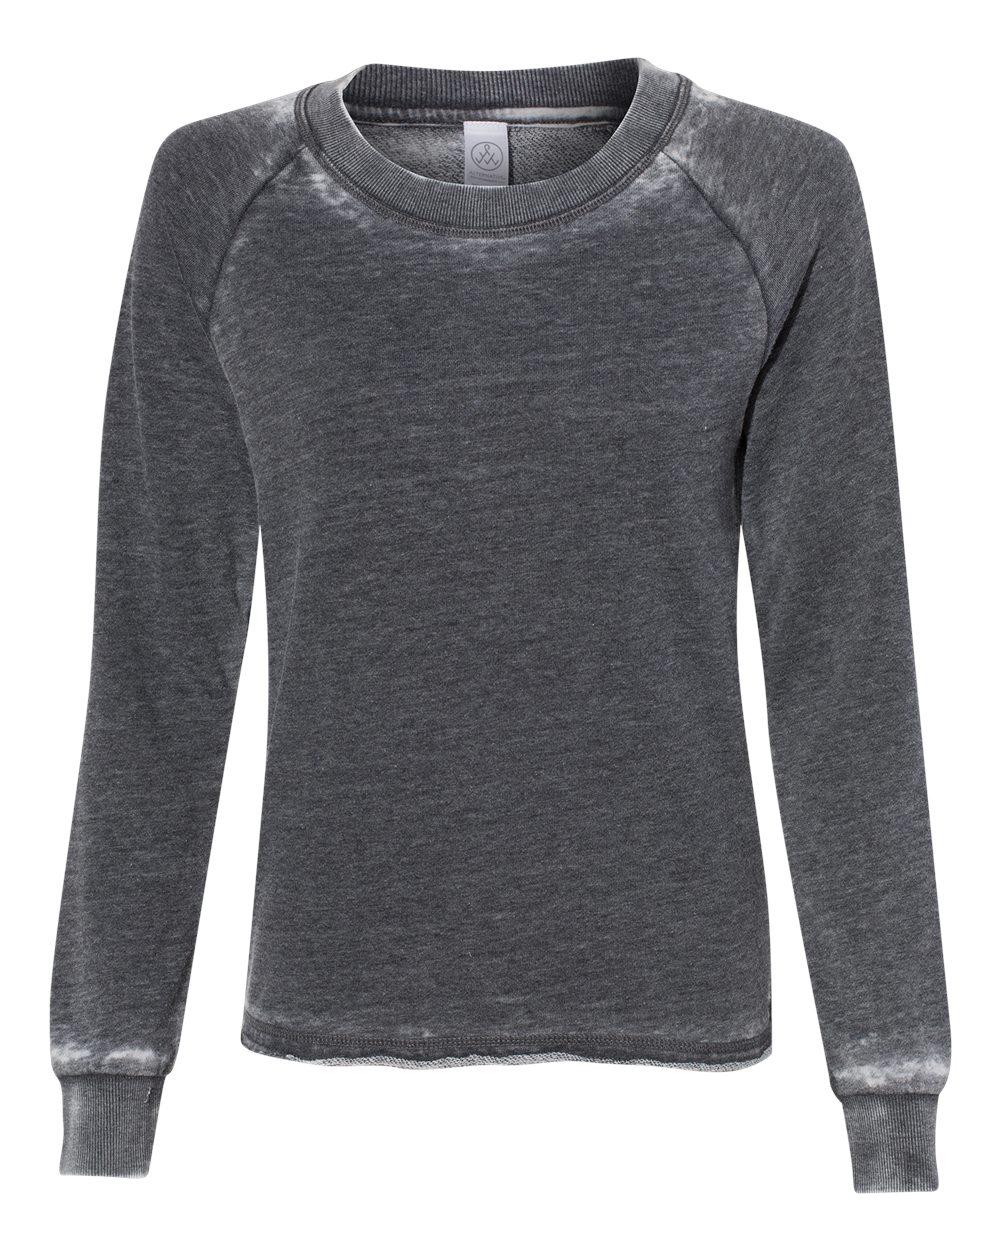 Alternative-Women-s-Lazy-Day-Burnout-French-Terry-LightSweatshirt-8626-up-to-XL thumbnail 15